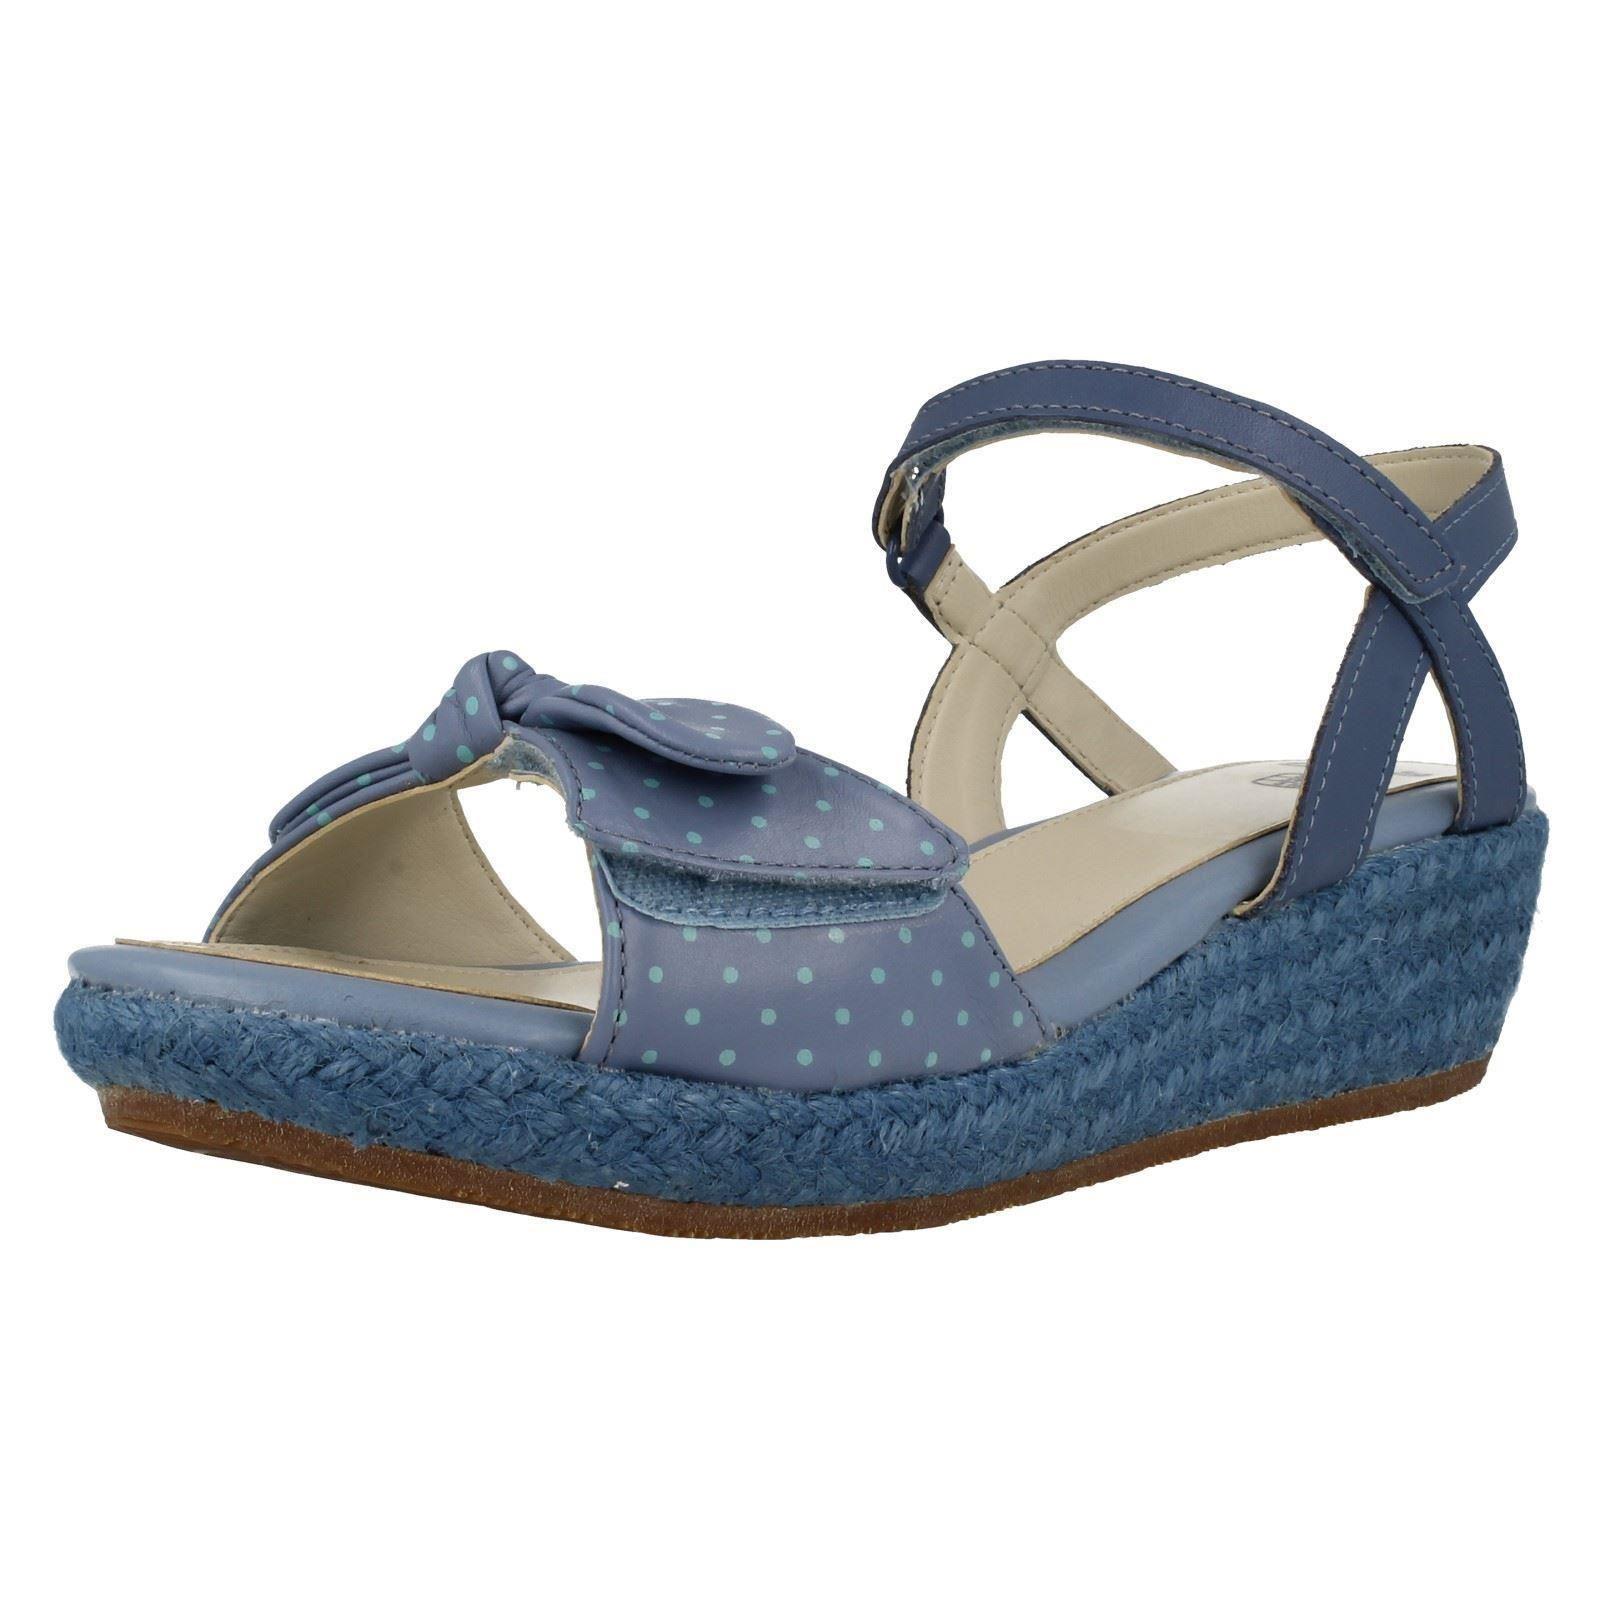 Clarks Summer Shoes Sale